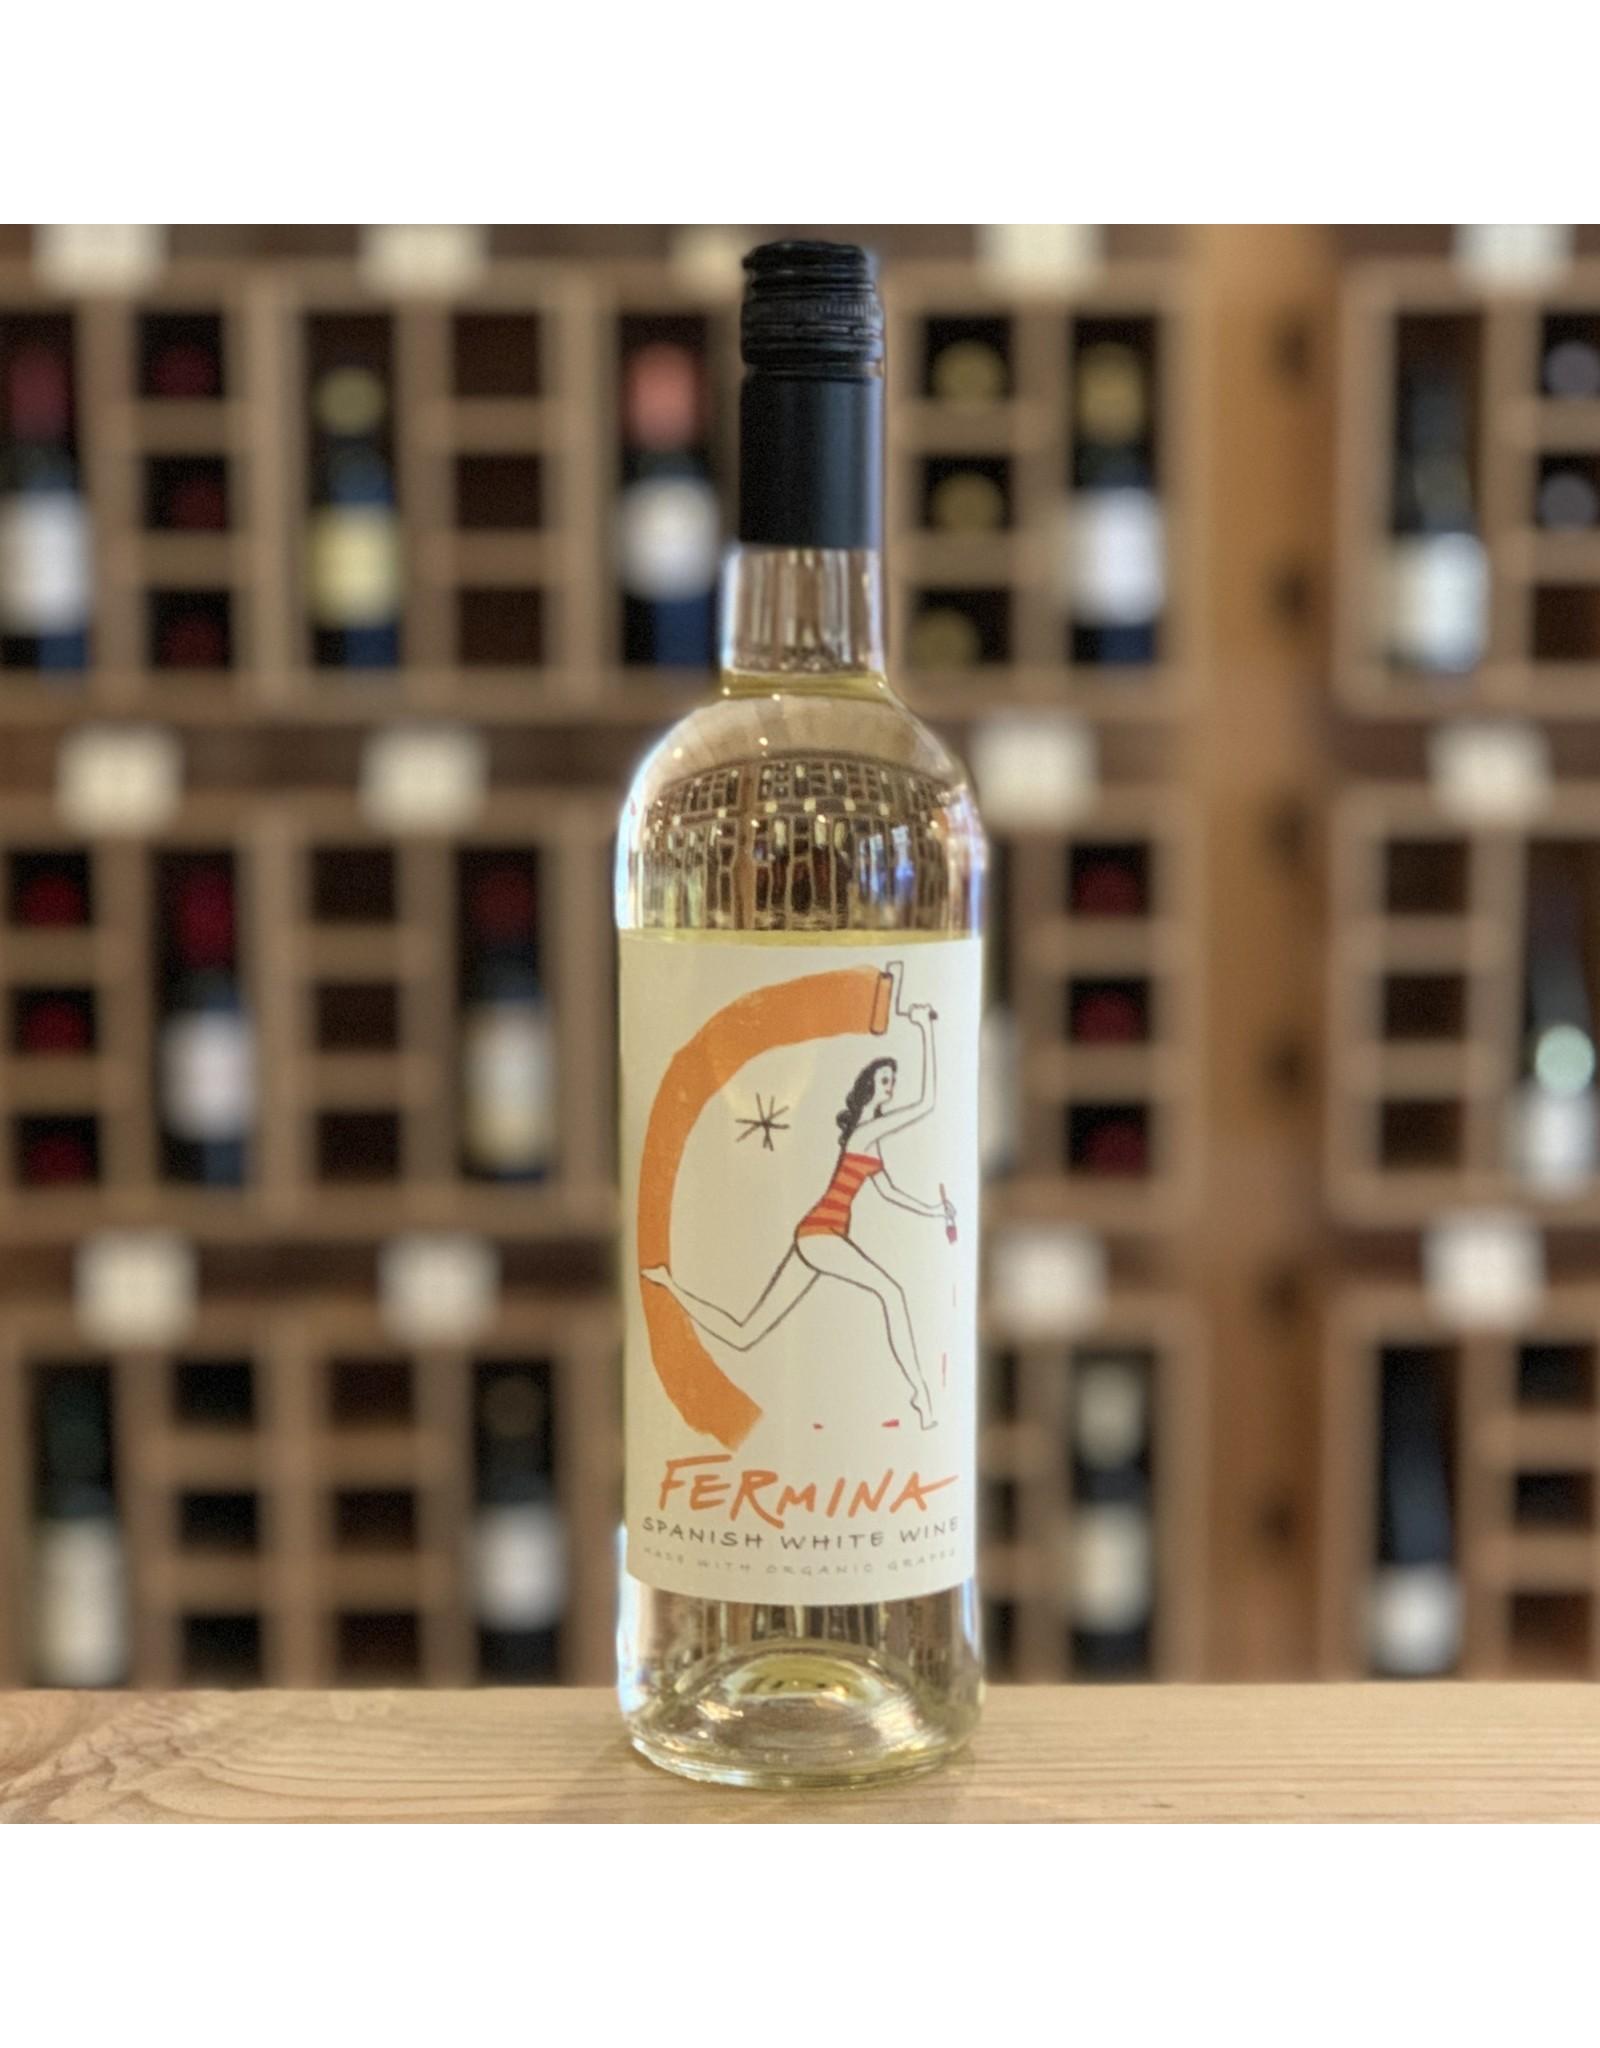 Organic Fermina Spanish White 2020 - Valencia, Spain